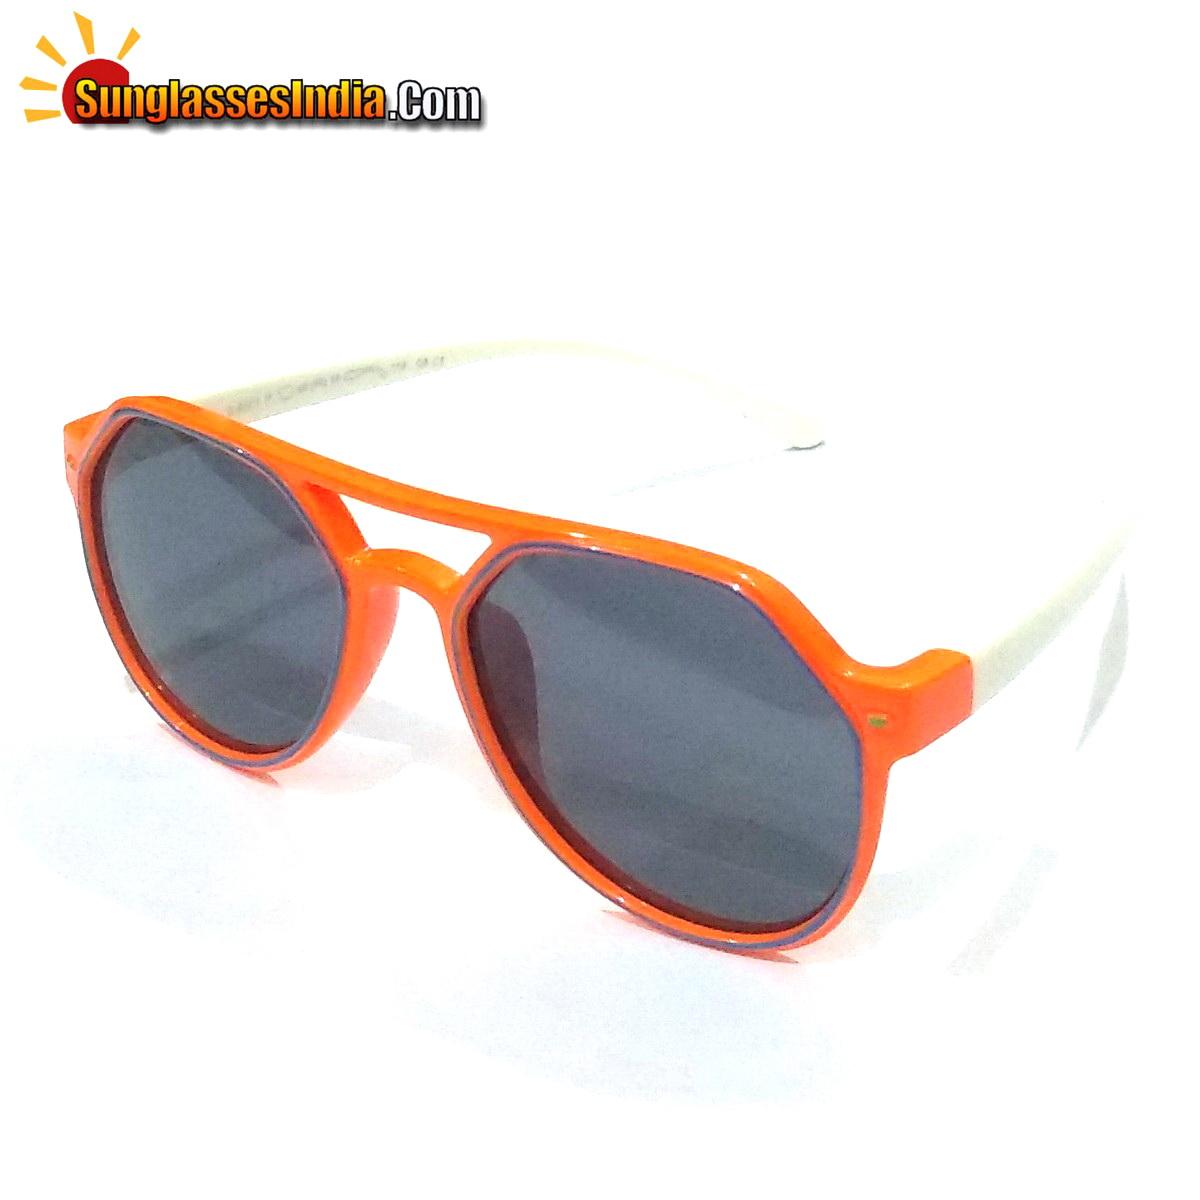 Unbreakable Kids Polarized Sunglasses Light Weight TR Material S8173Orange